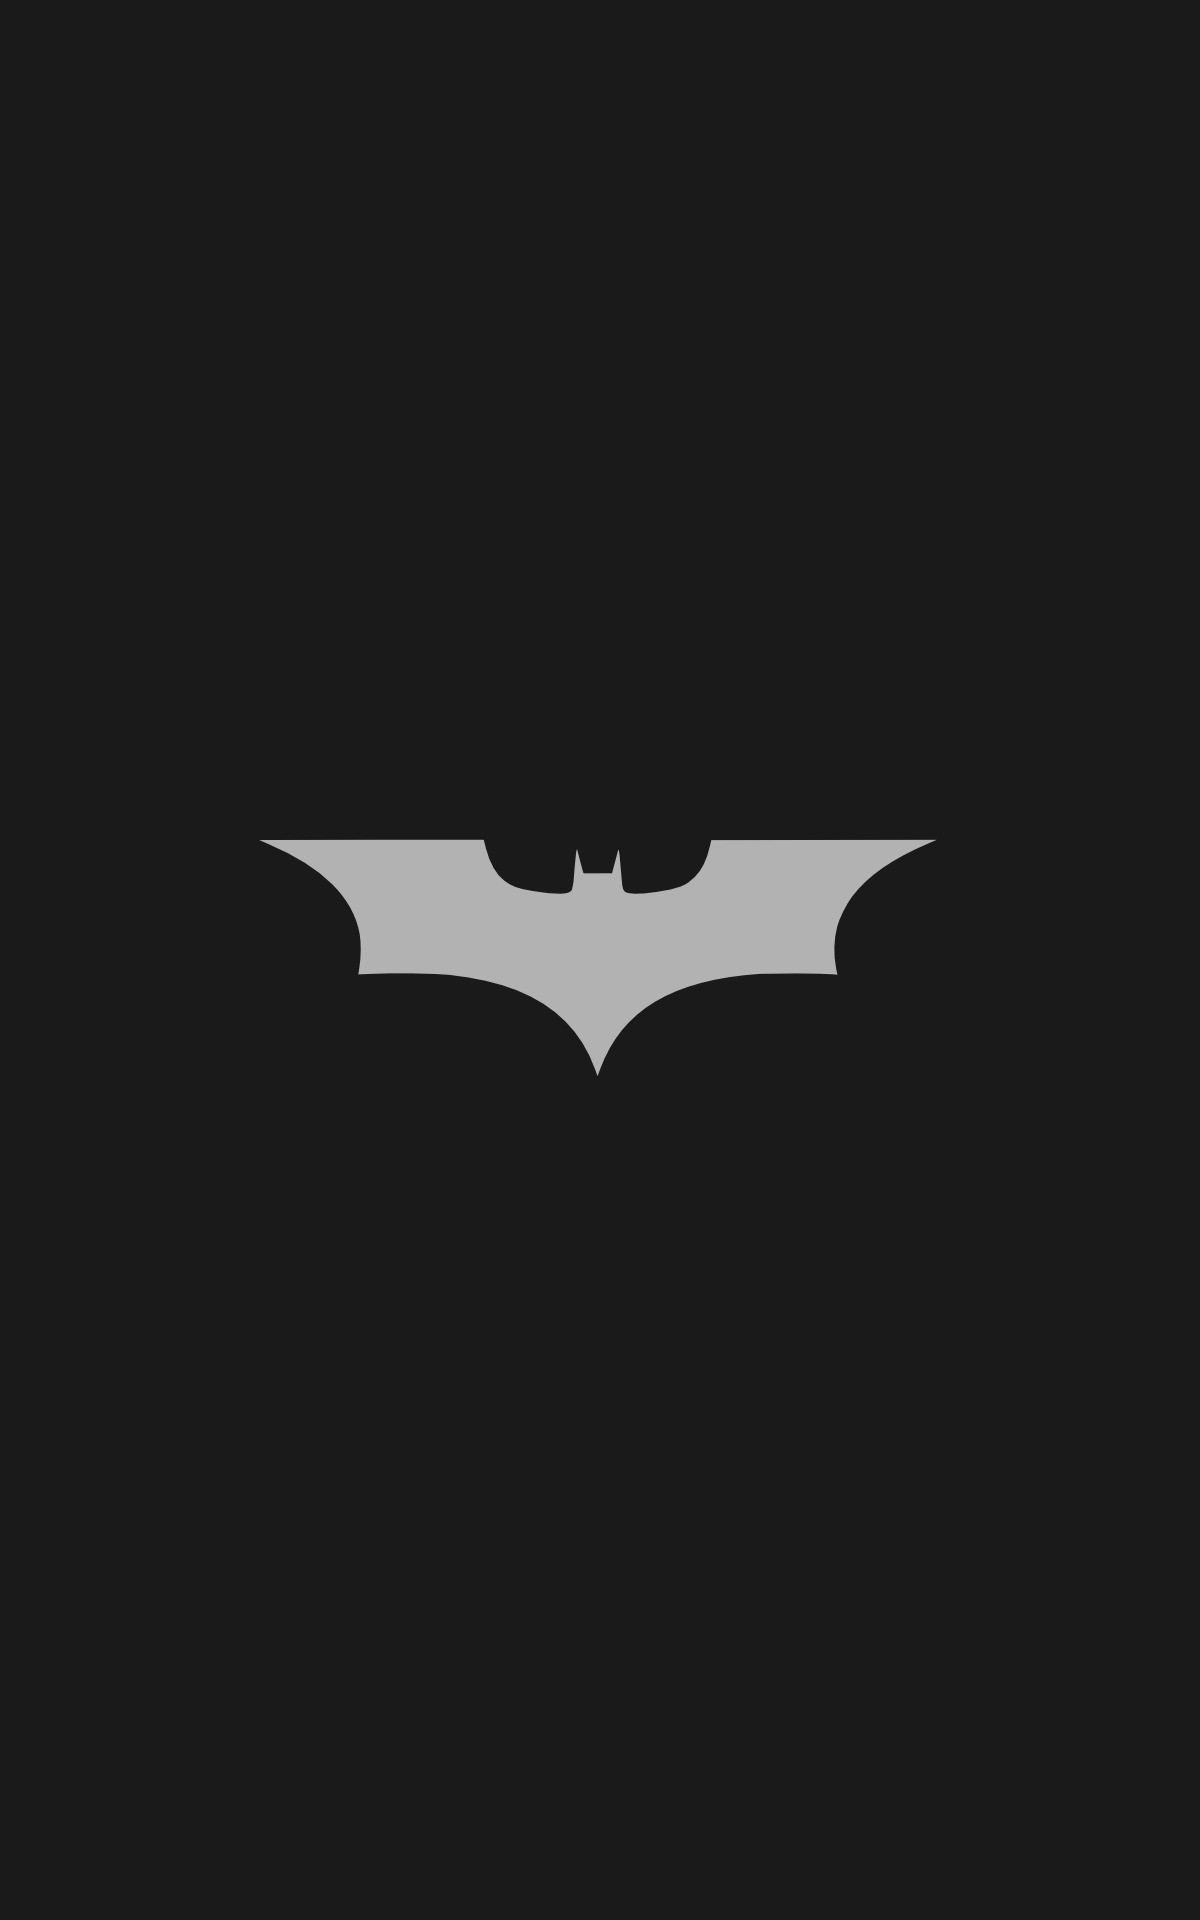 Batman Logo, Batman, Minimalism, Portrait Display Wallpapers HD / Desktop  and Mobile Backgrounds